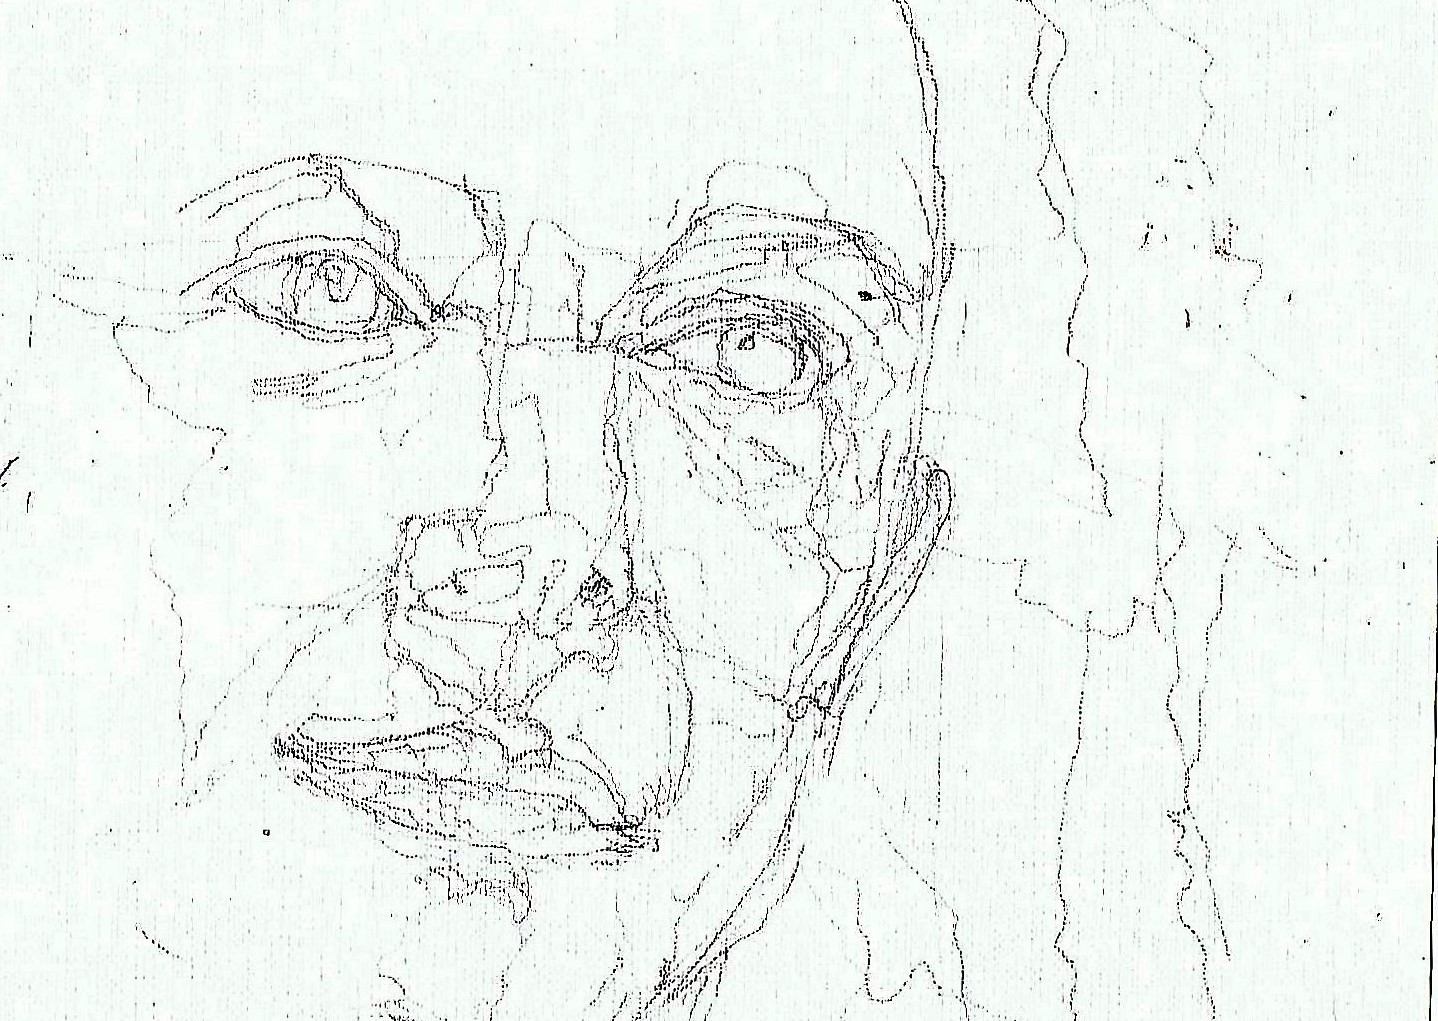 365 dagen een portret 167 Femke Halsema, politica Potlood 19c25